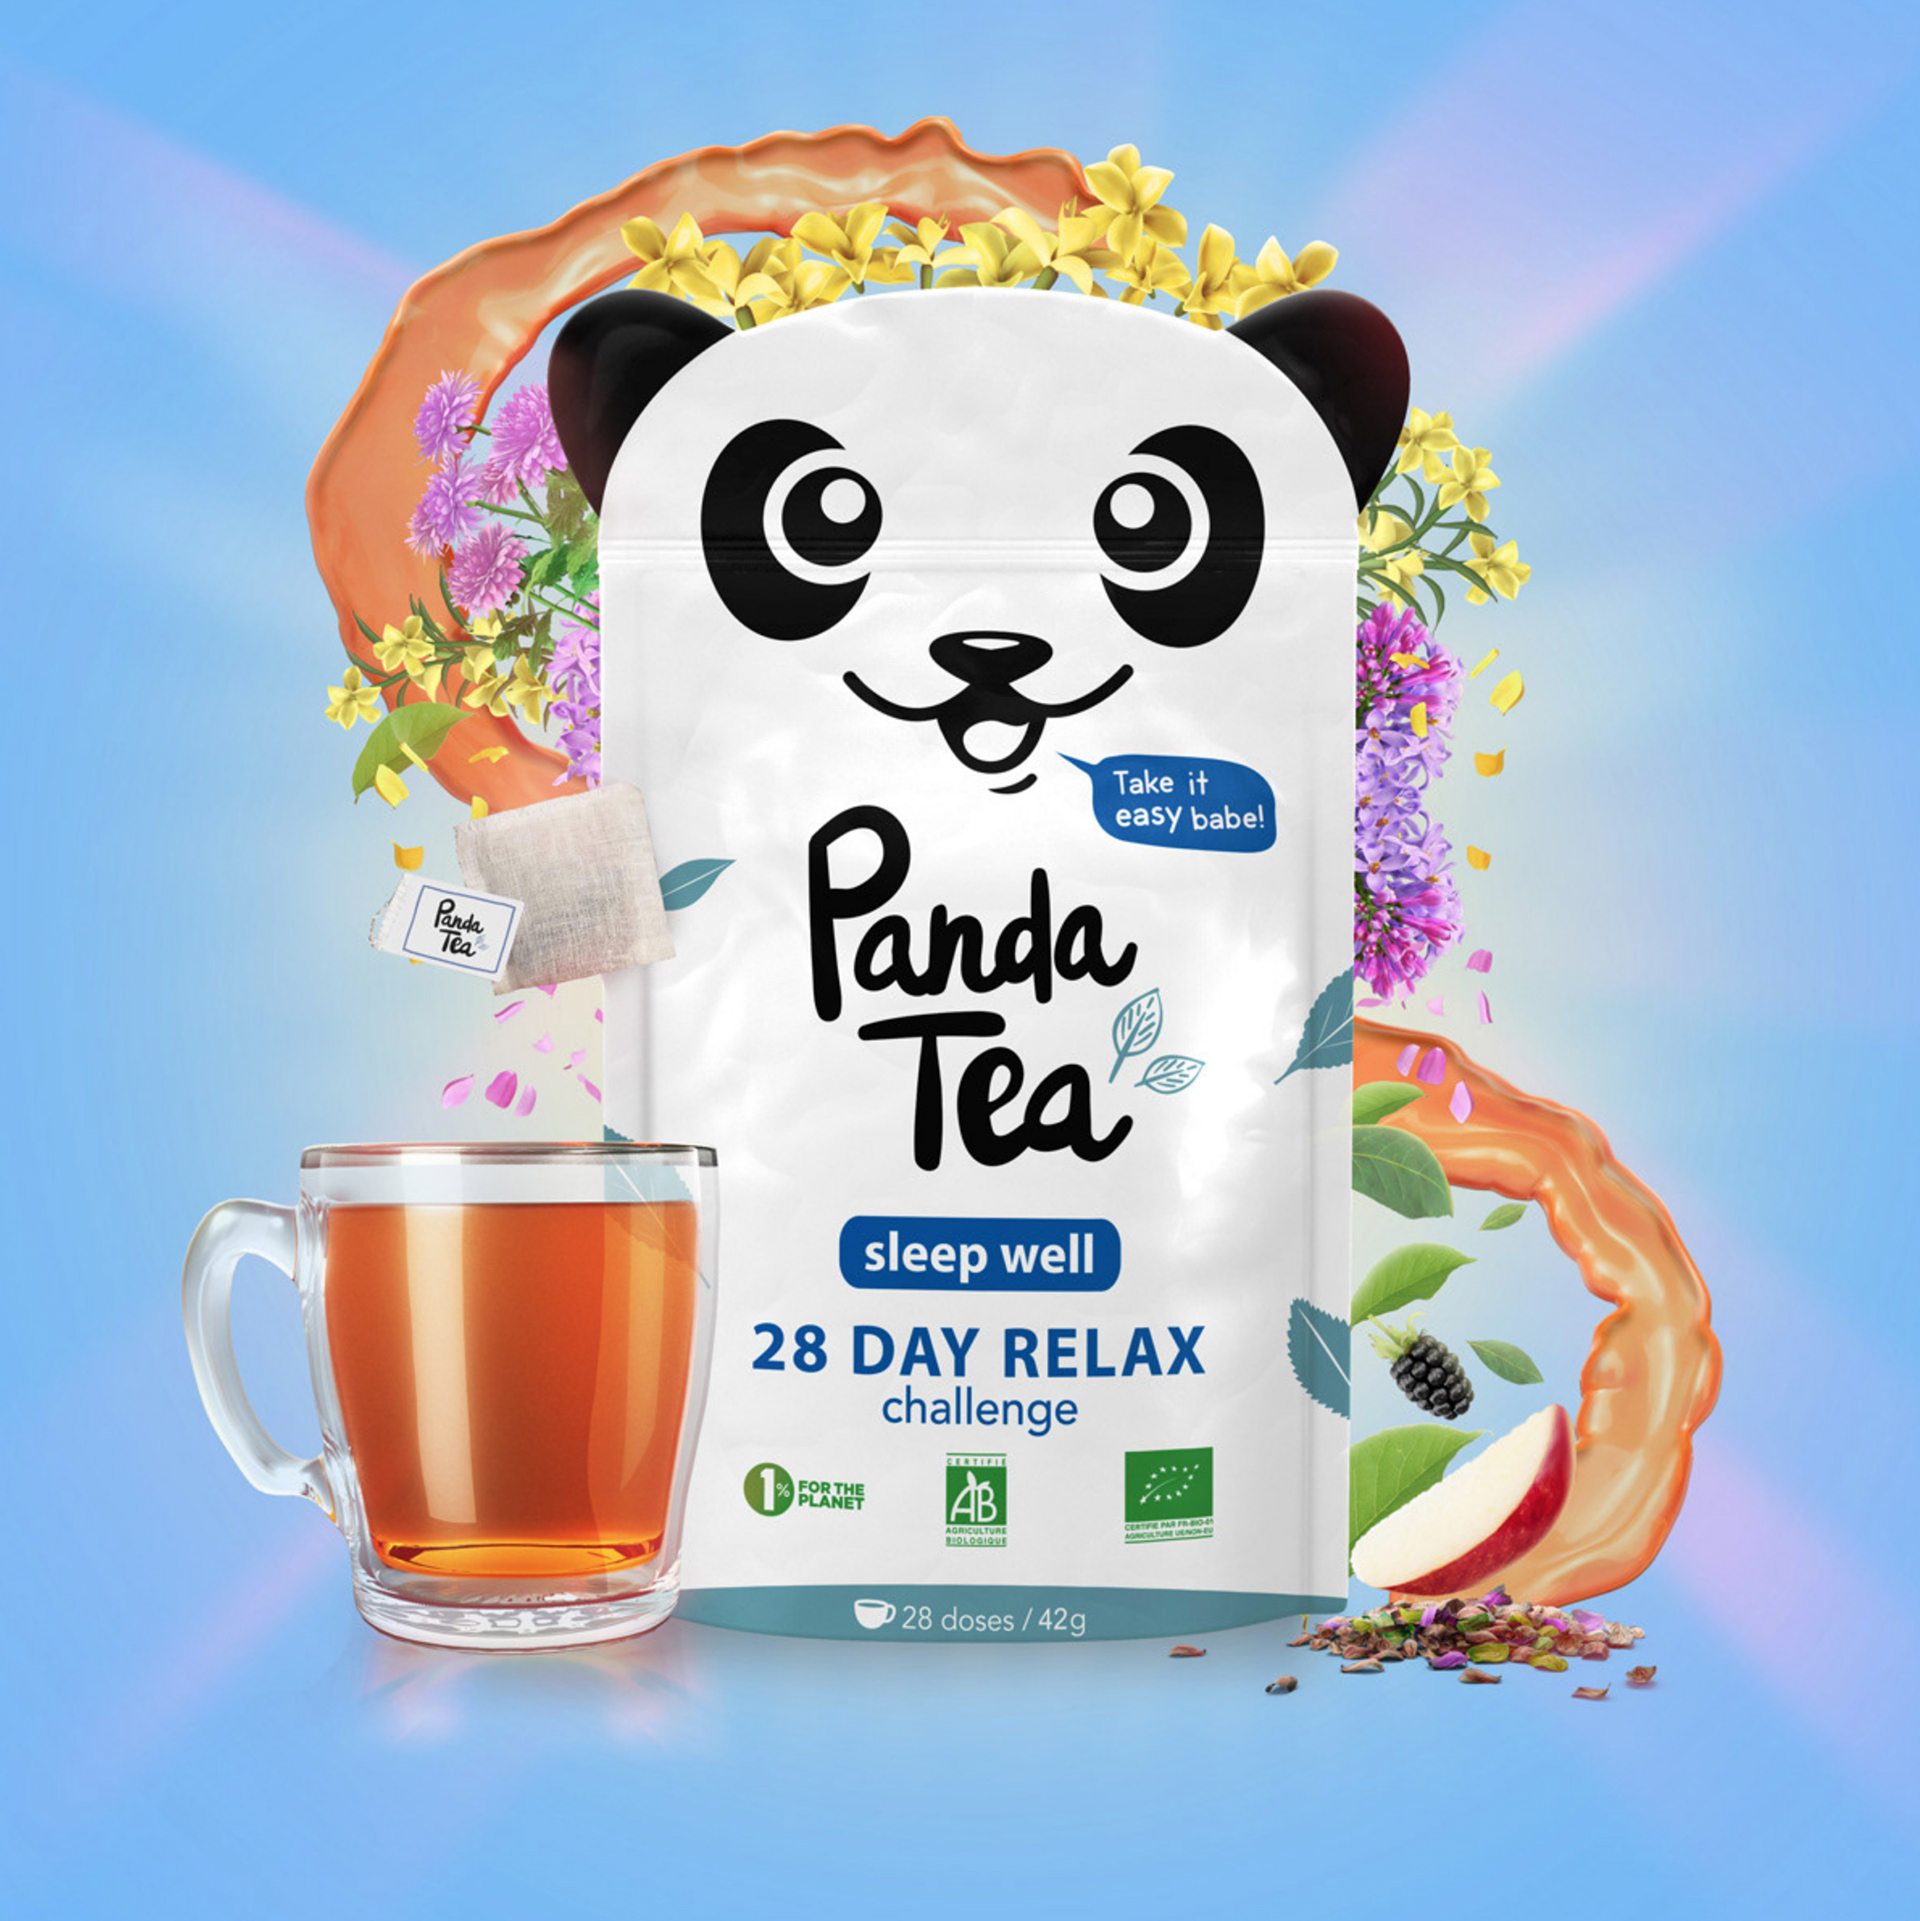 3D Liquid Panda Tea Packaging Illustration